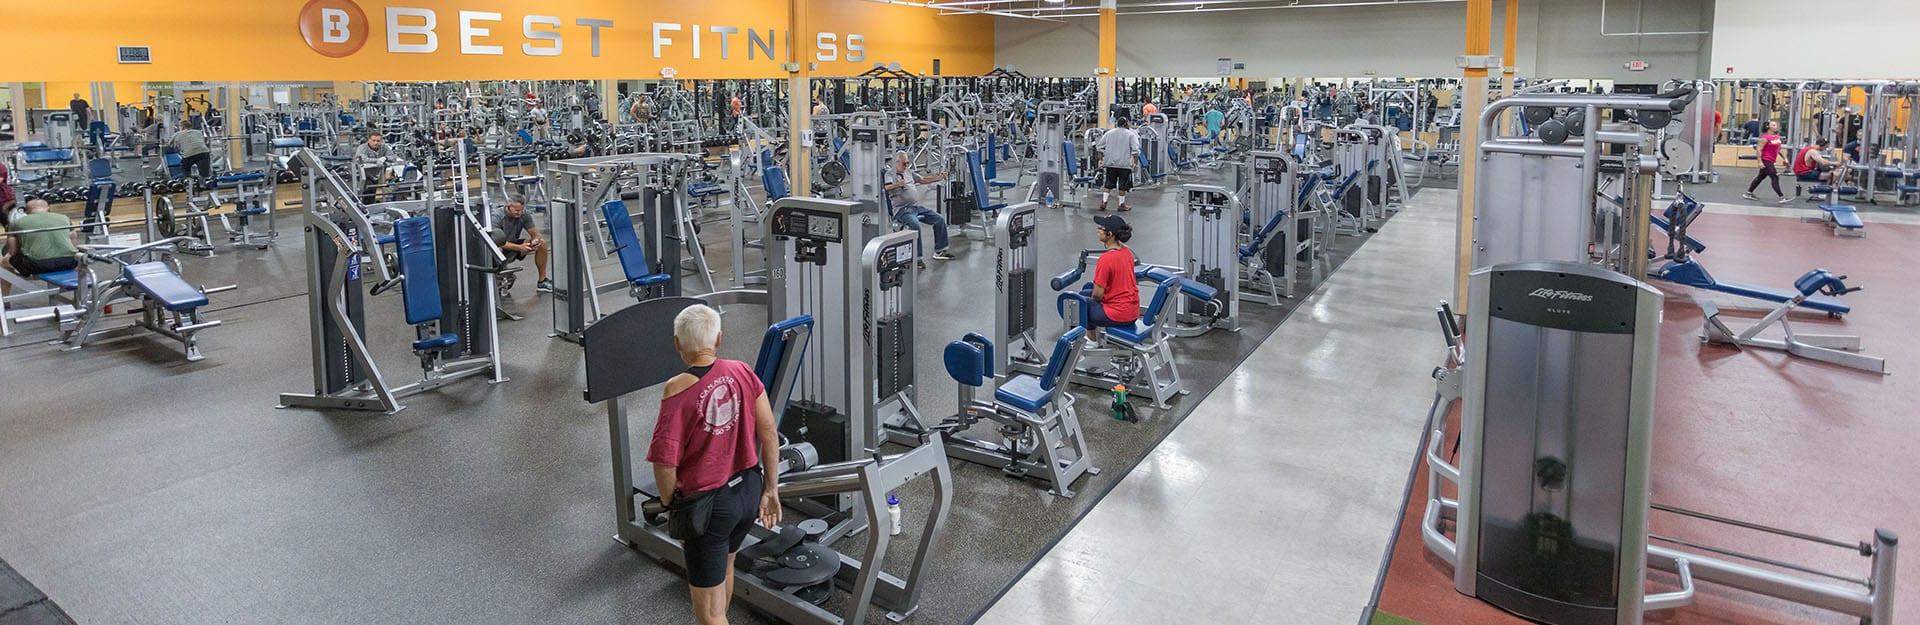 Best Fitness Schenectady 518 836 5624 Schenectady Ny Gym